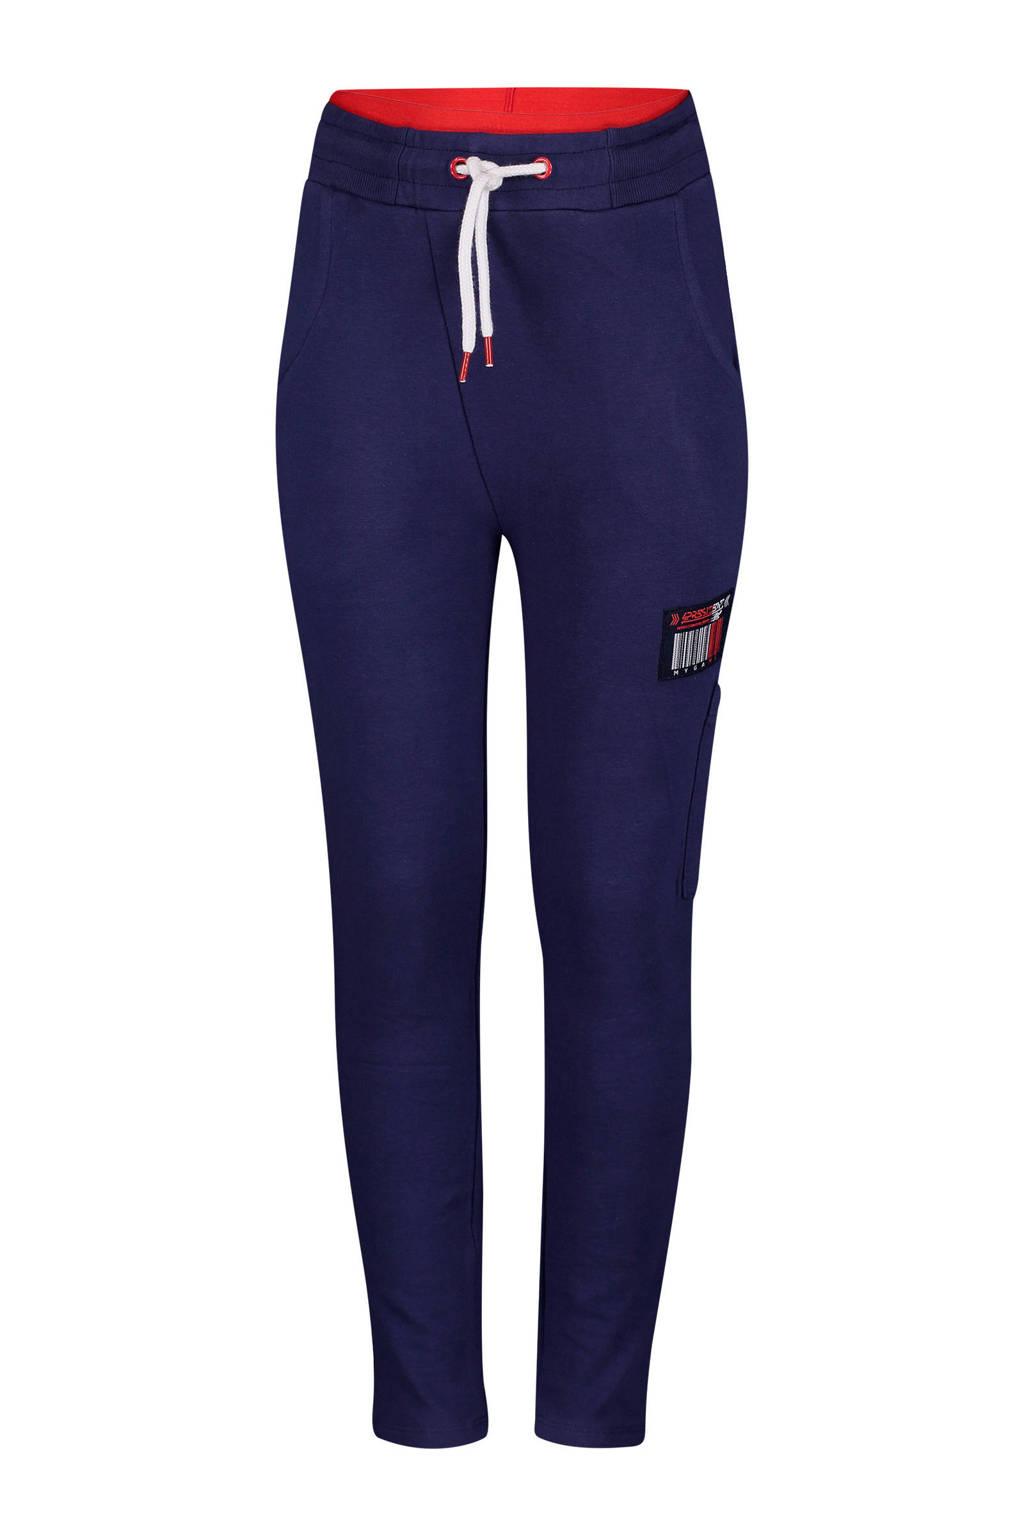 4PRESIDENT tapered fit joggingbroek Dariel donkerblauw/rood, Donkerblauw/rood